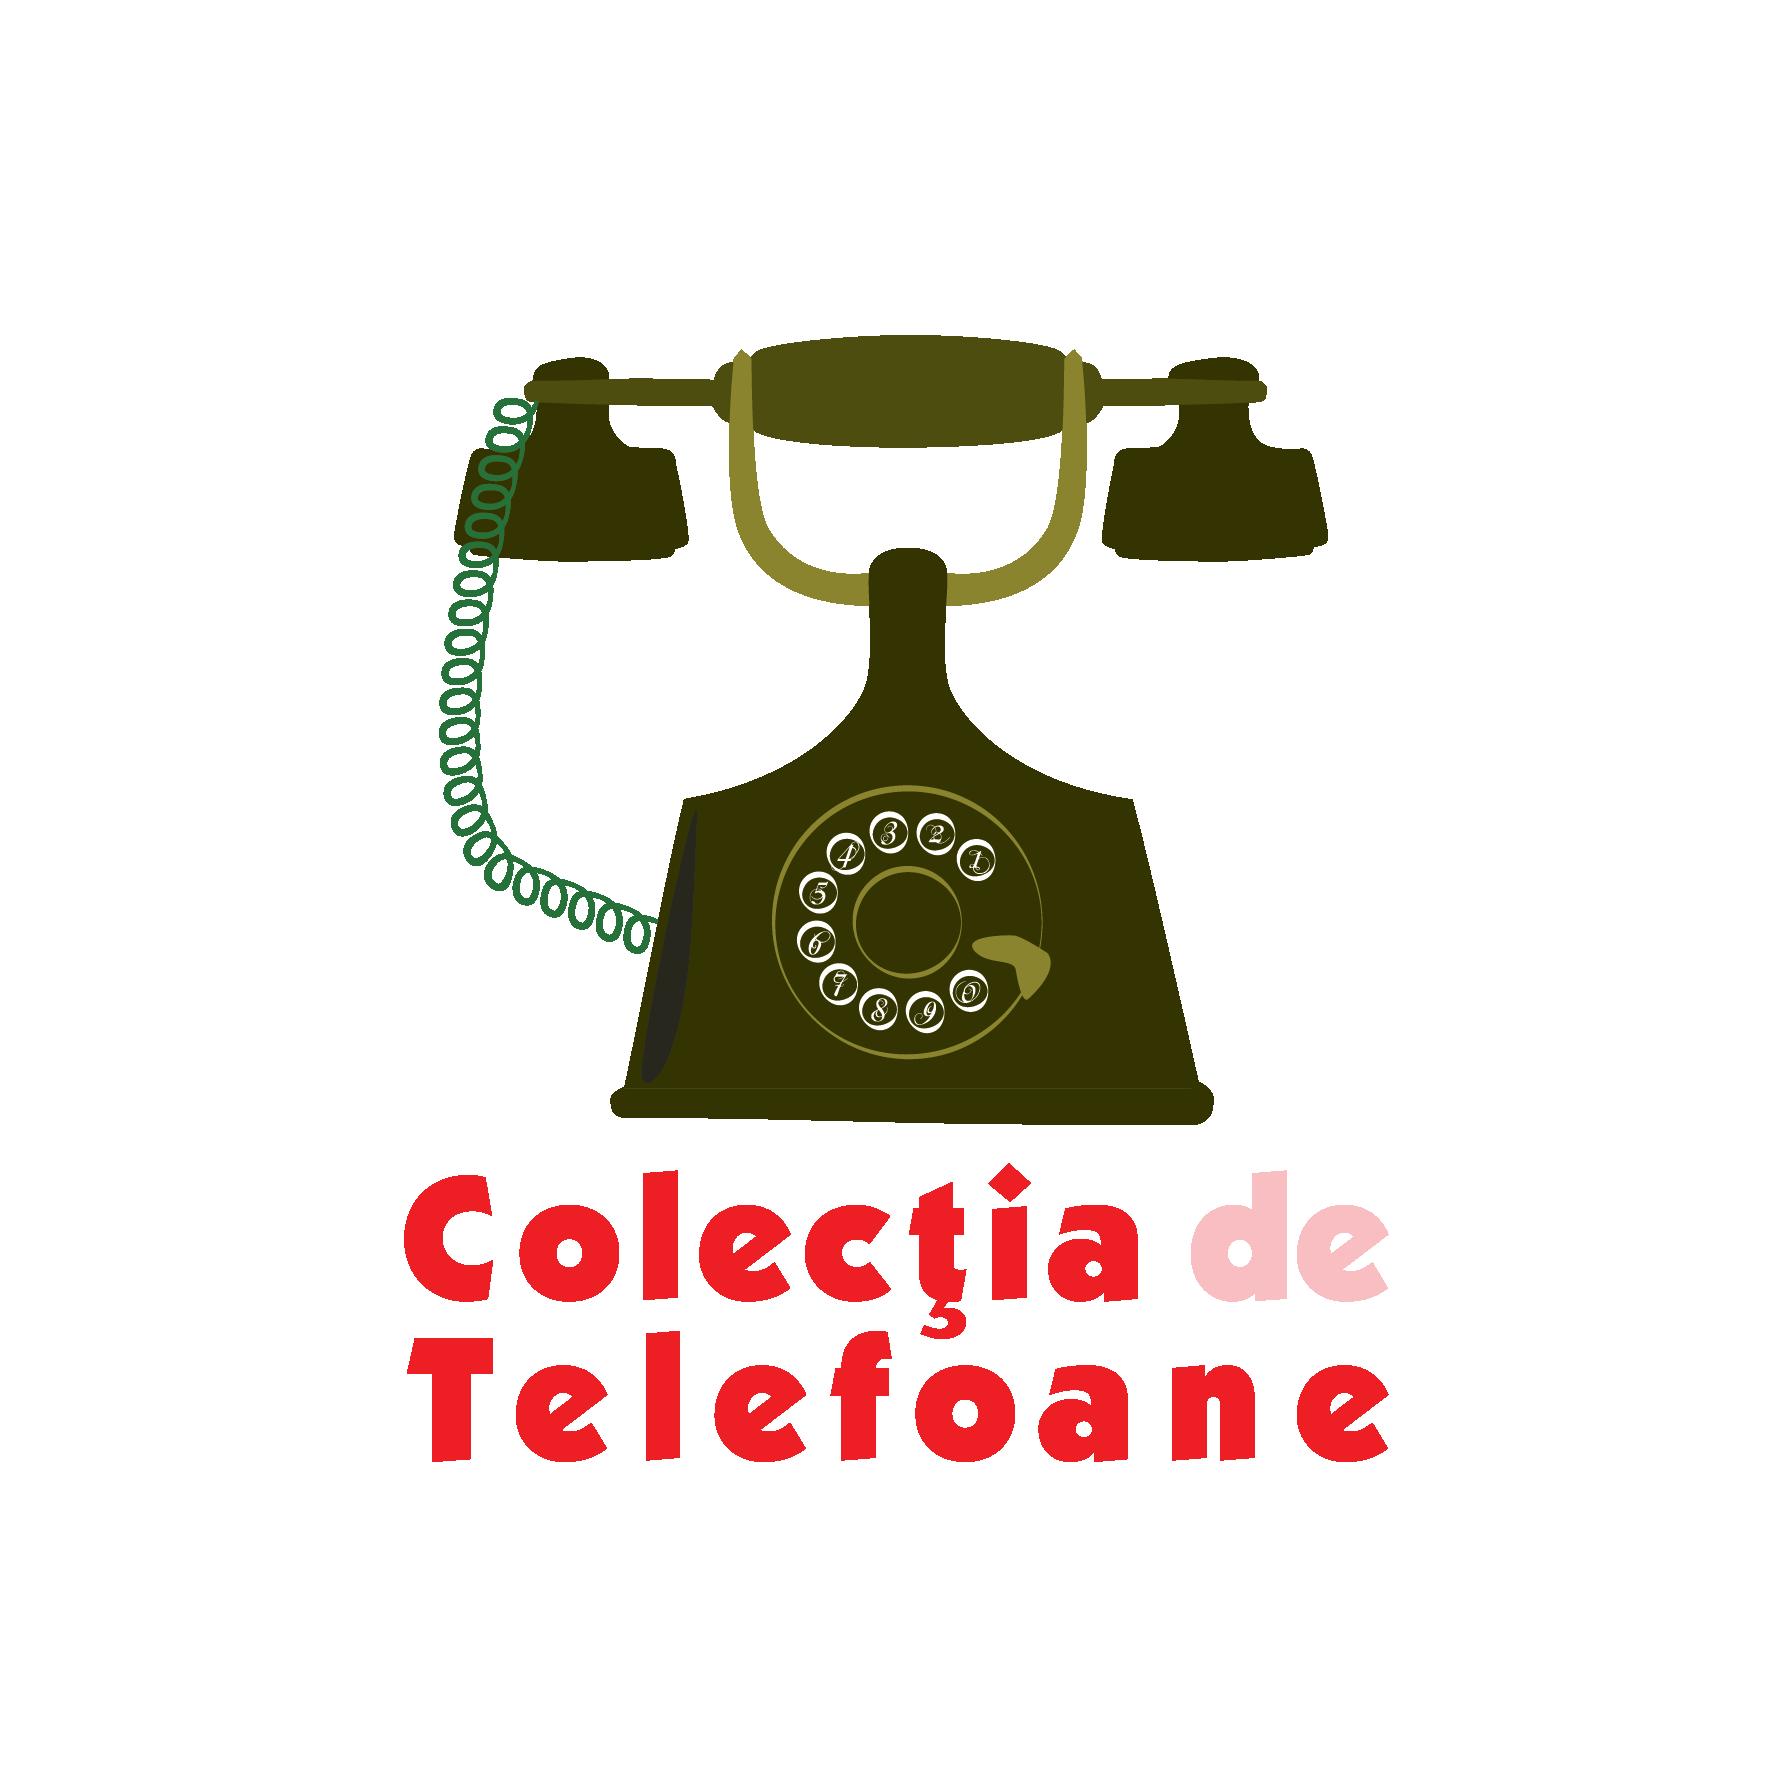 Colectia de Telefoane